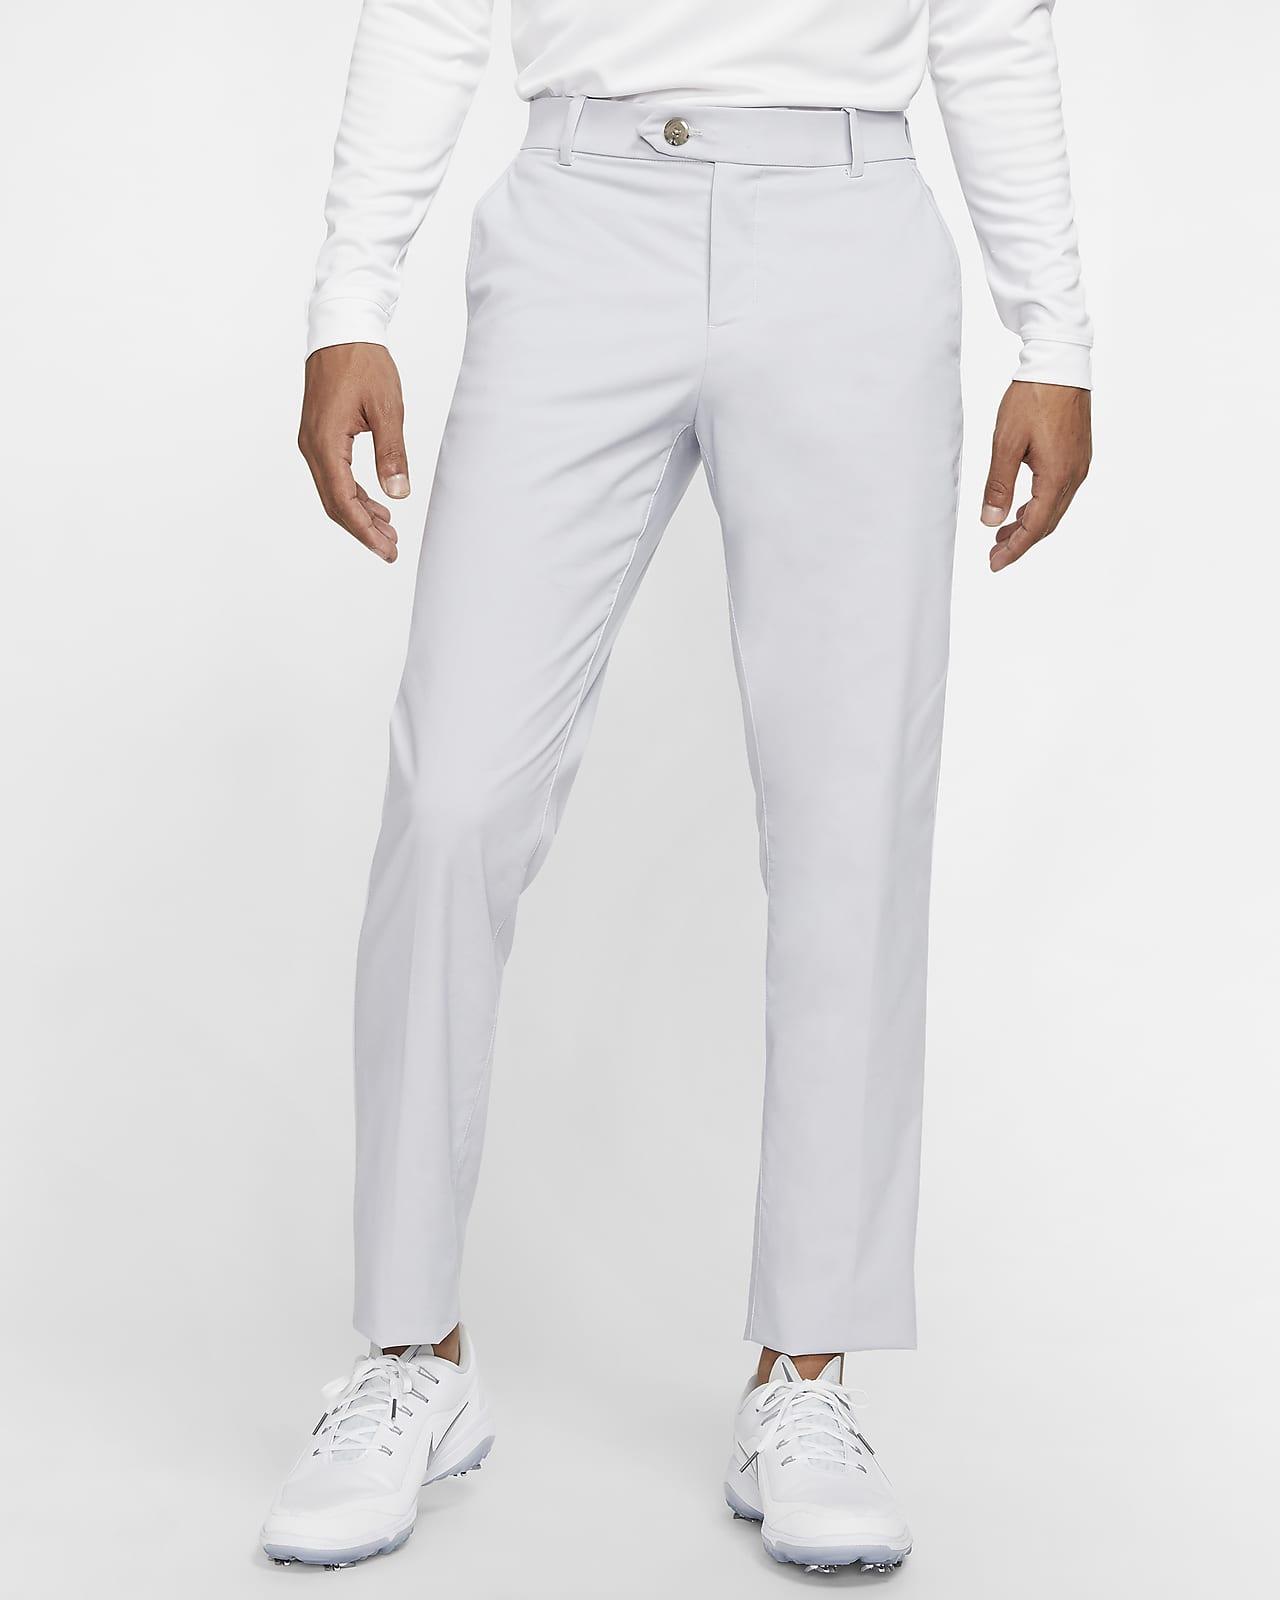 Nike Flex Player Herren-Golfhose